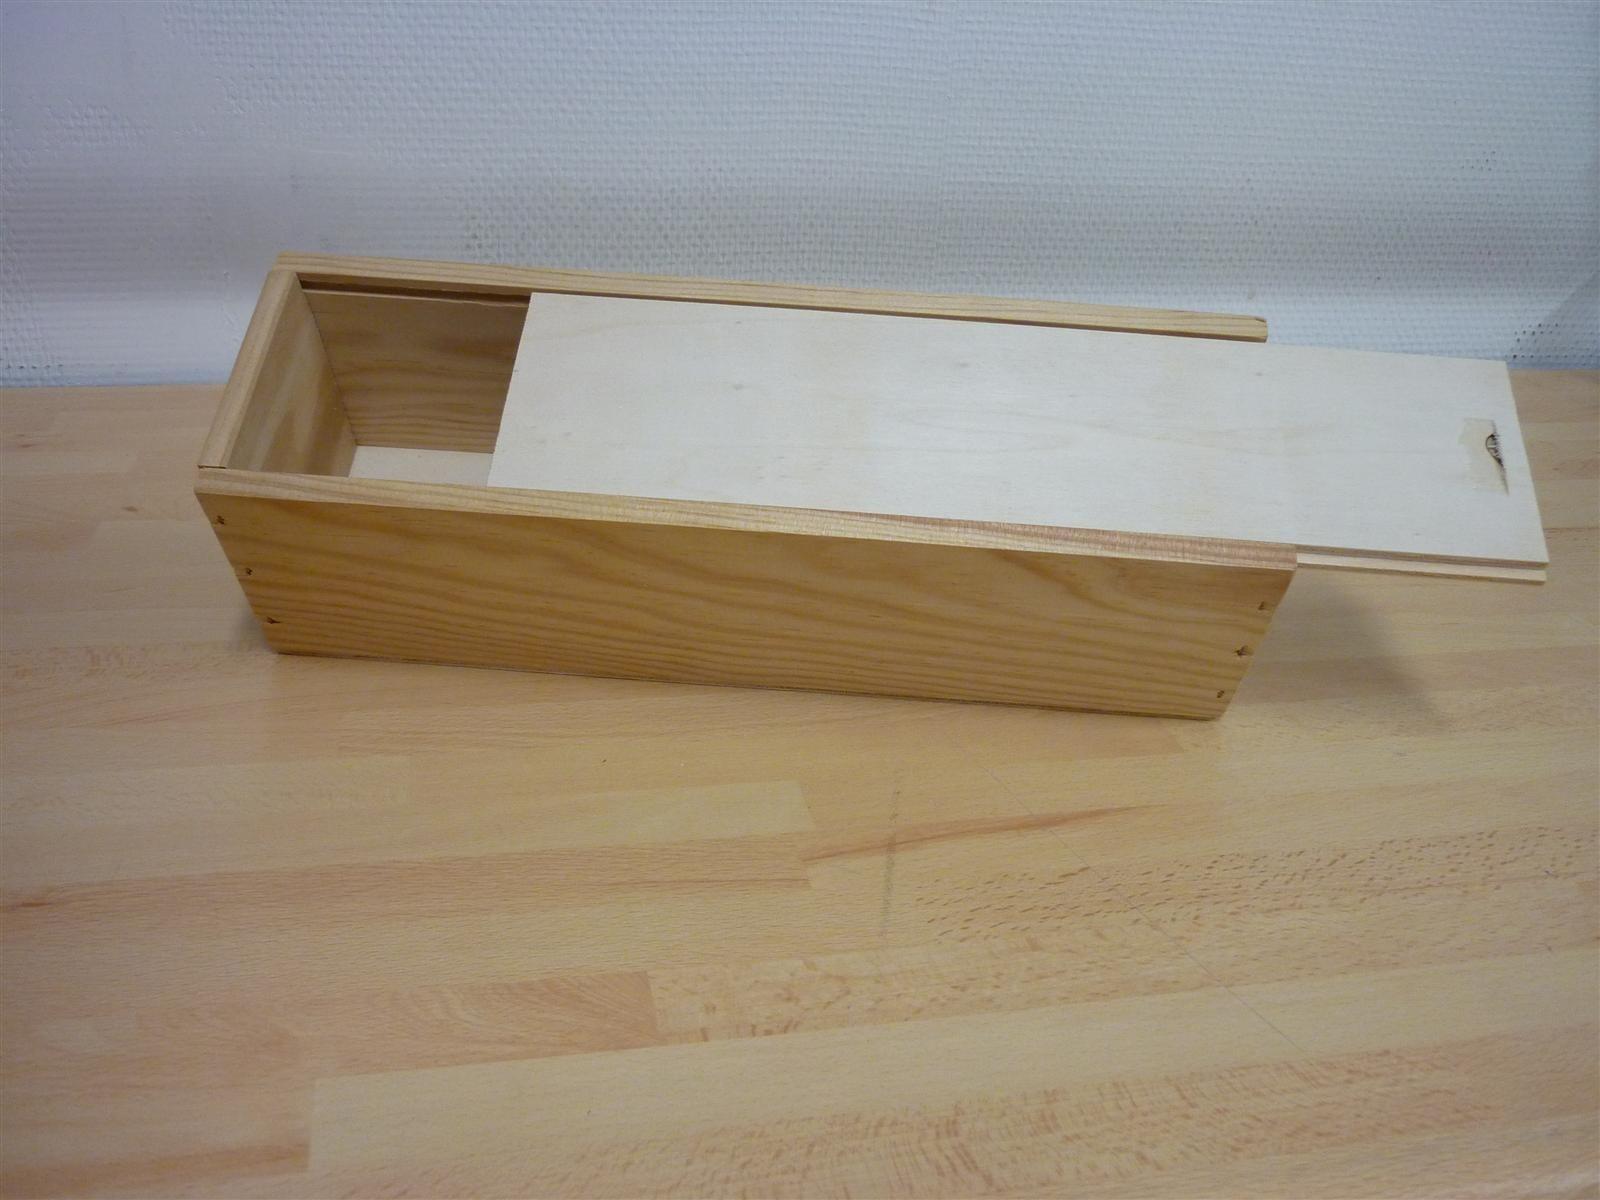 caisse en bois vin vide caisse bois vin vide paul. Black Bedroom Furniture Sets. Home Design Ideas